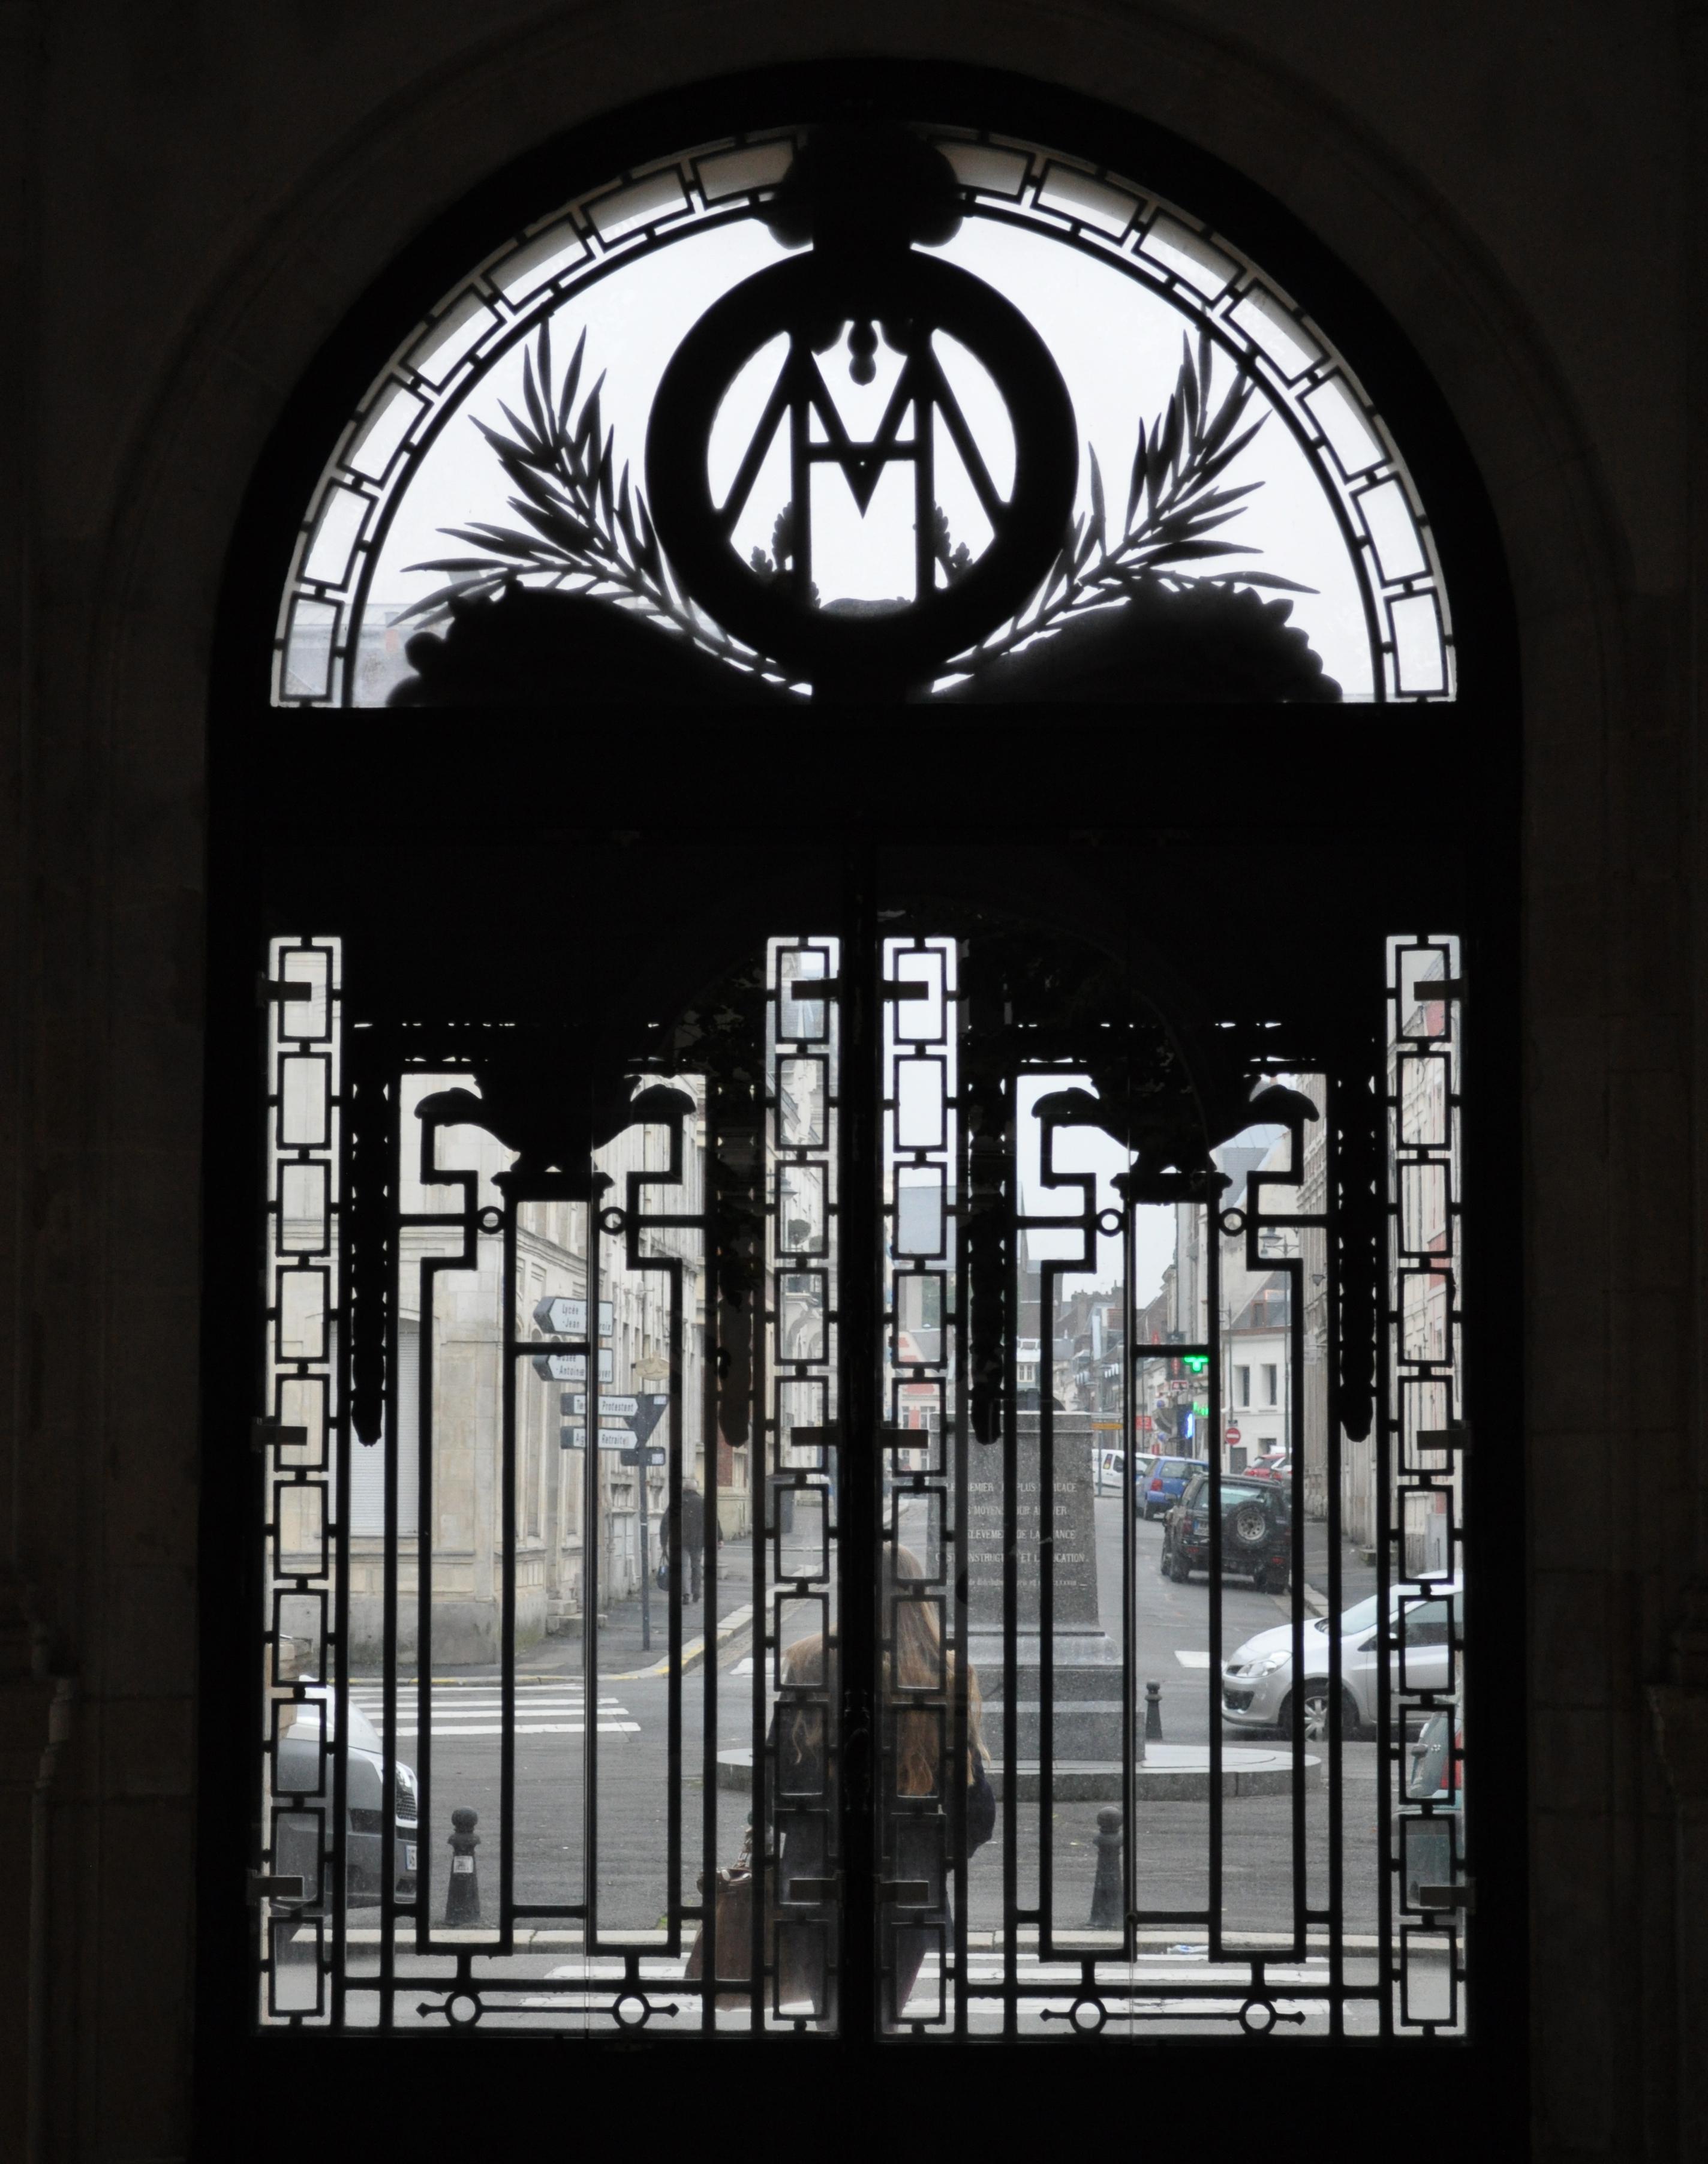 Portes ouvertes le samedi 10 f vrier 2018 cpge henri martin - Lycee henri wallon valenciennes portes ouvertes ...